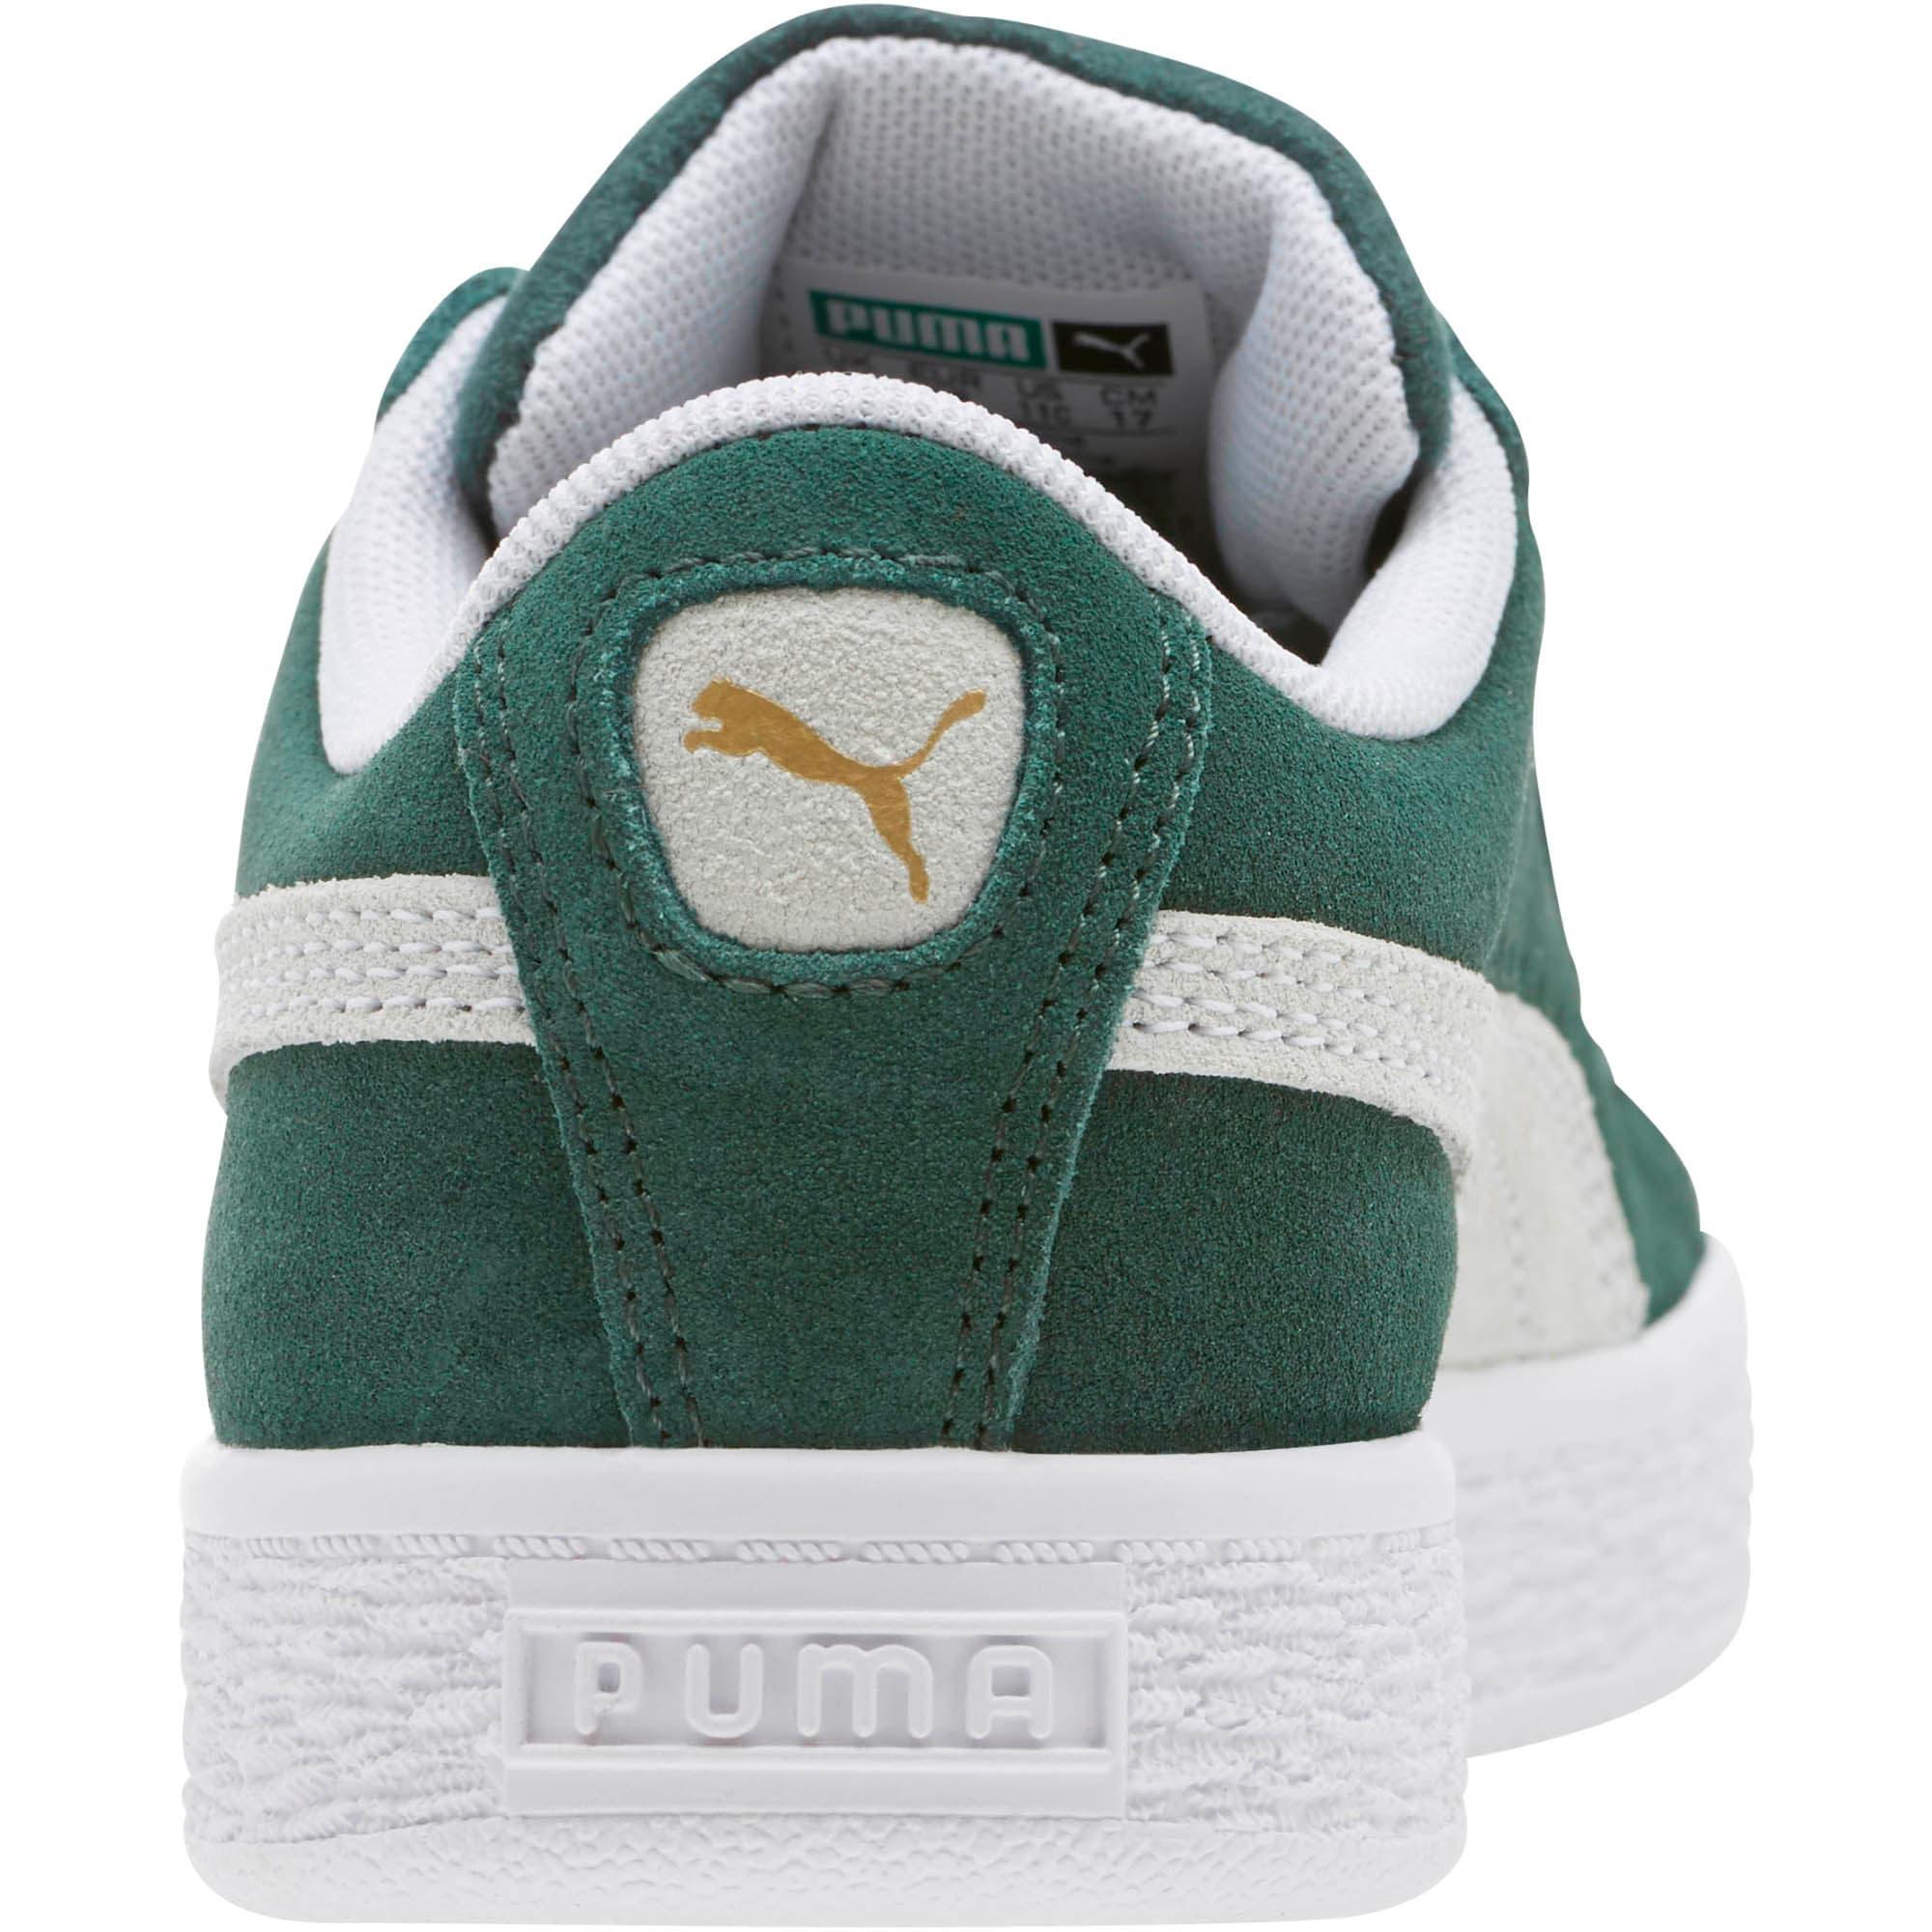 Thumbnail 4 of Suede Classics Little Kids' Shoes, Pineneedle-Puma White, medium